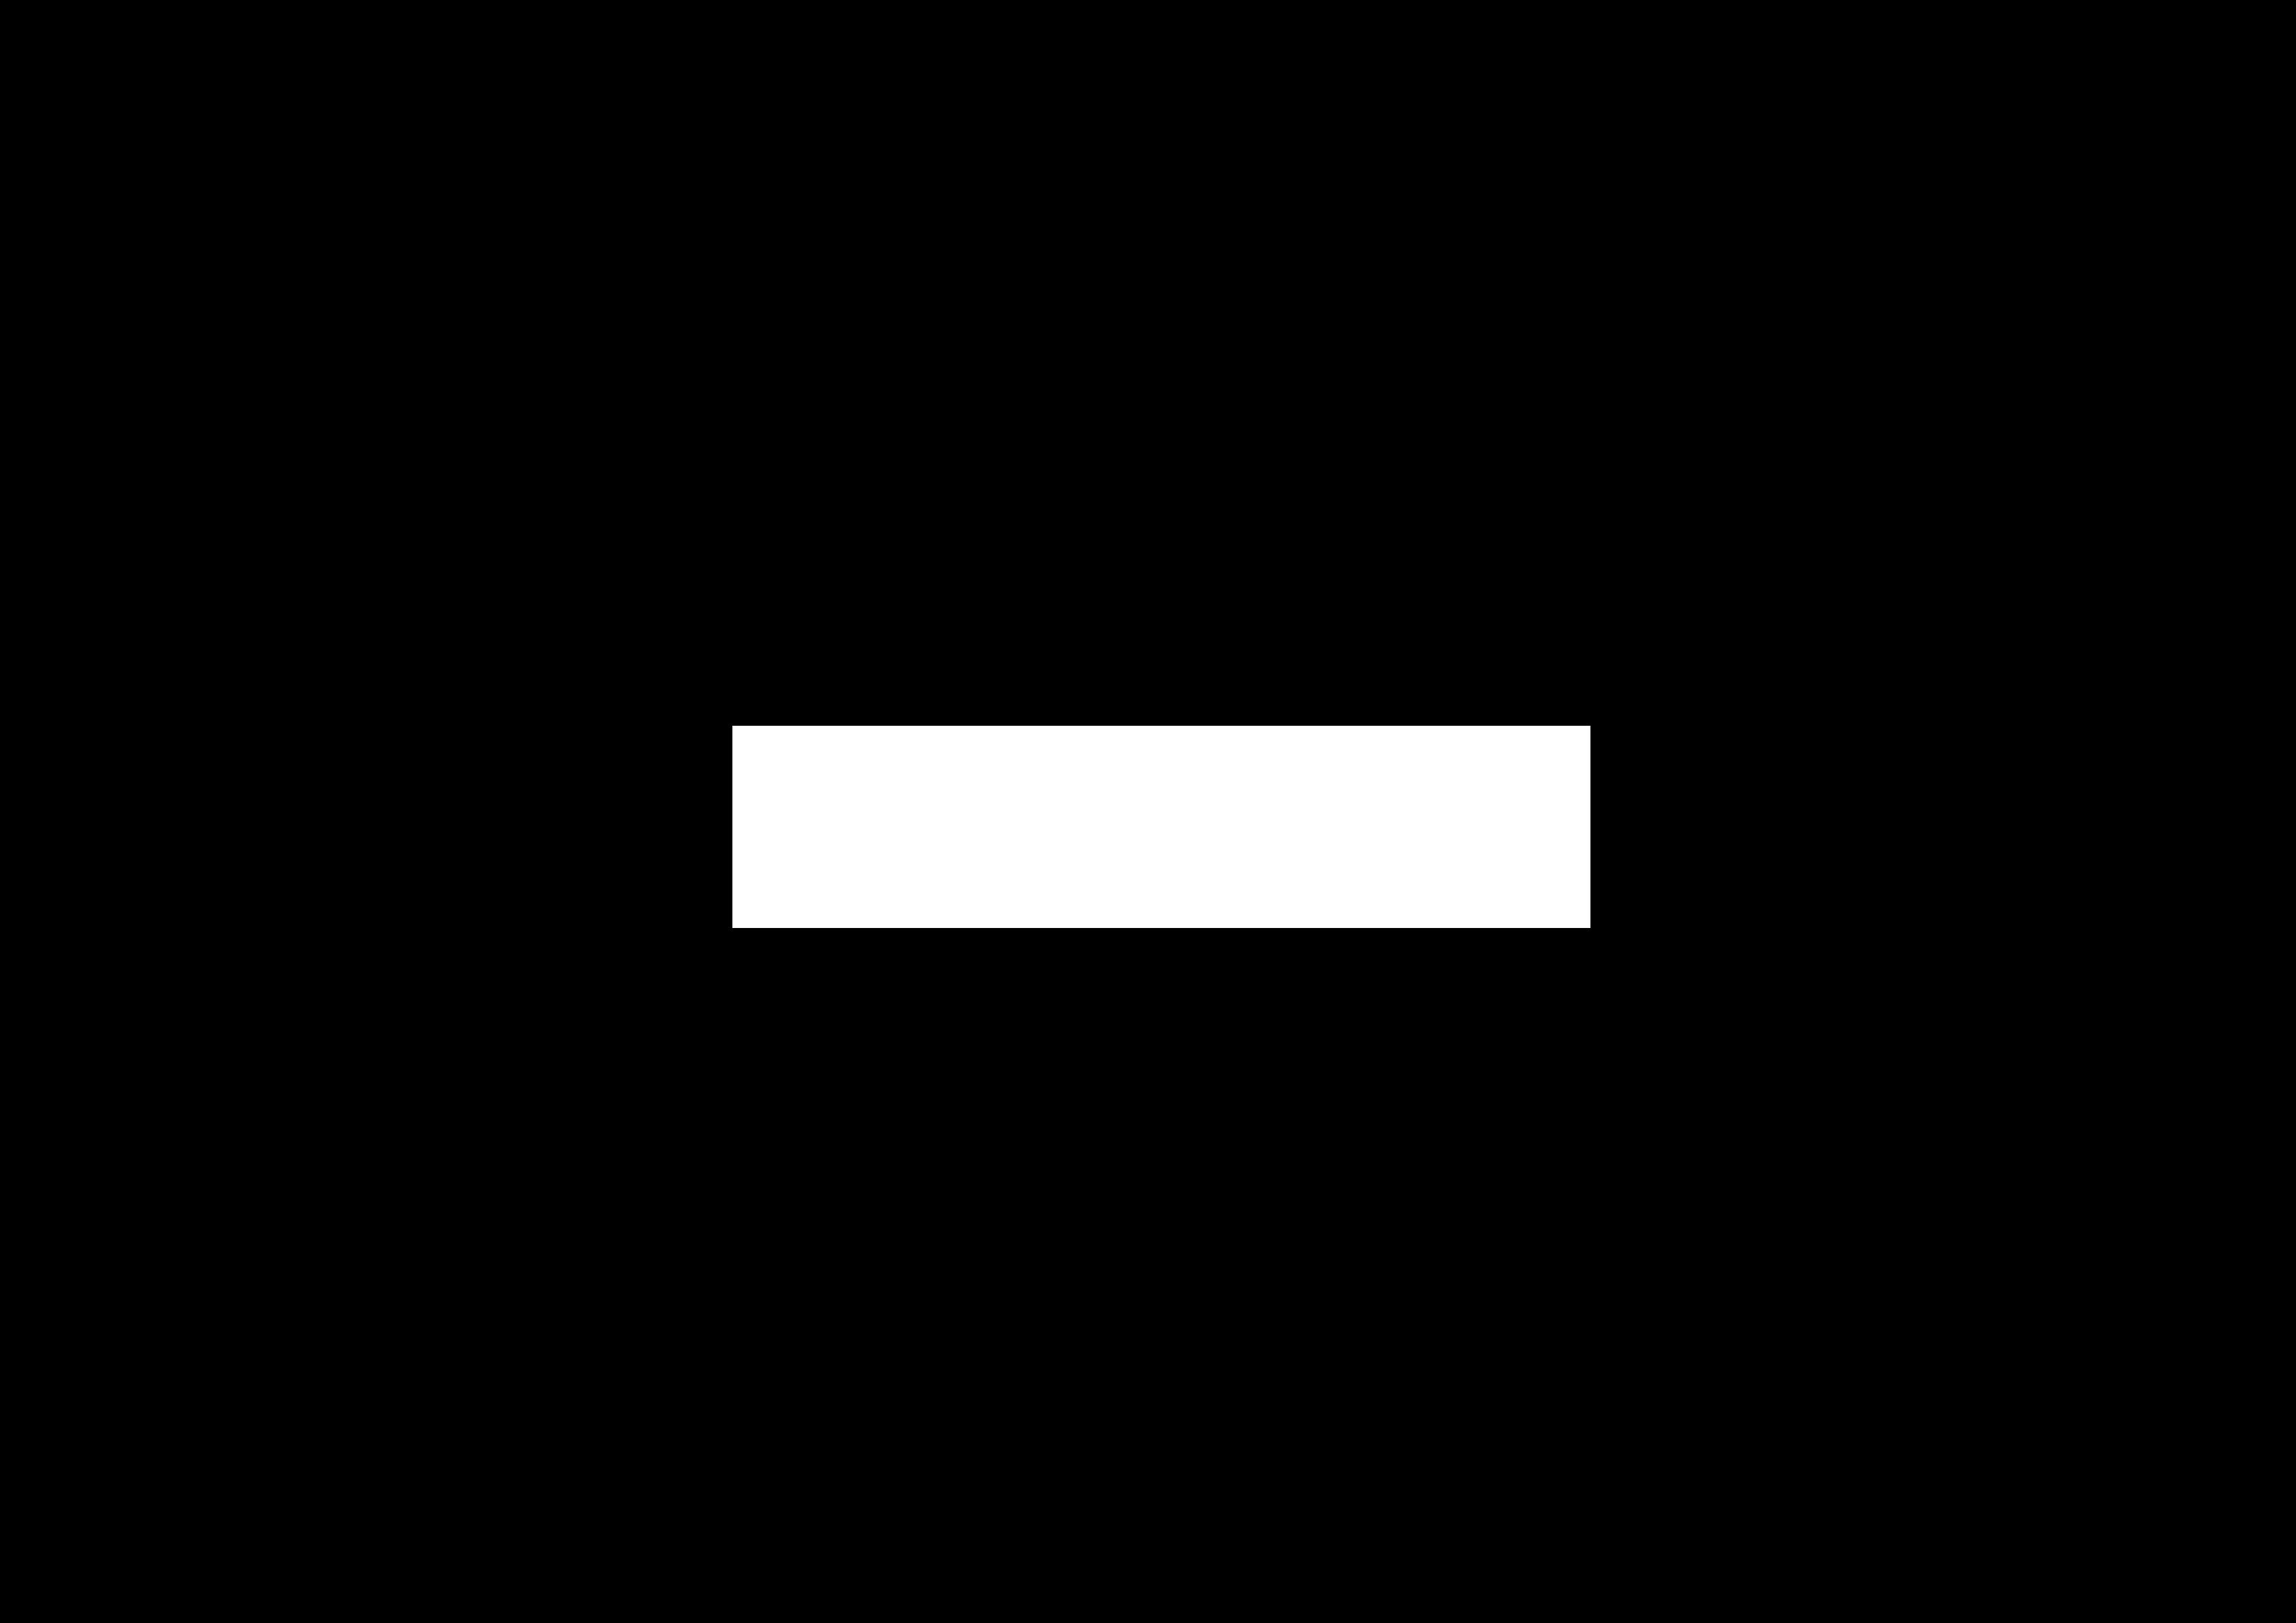 Ближе к телу: специальная съемка Louis Vuitton x BURO. (фото 25)